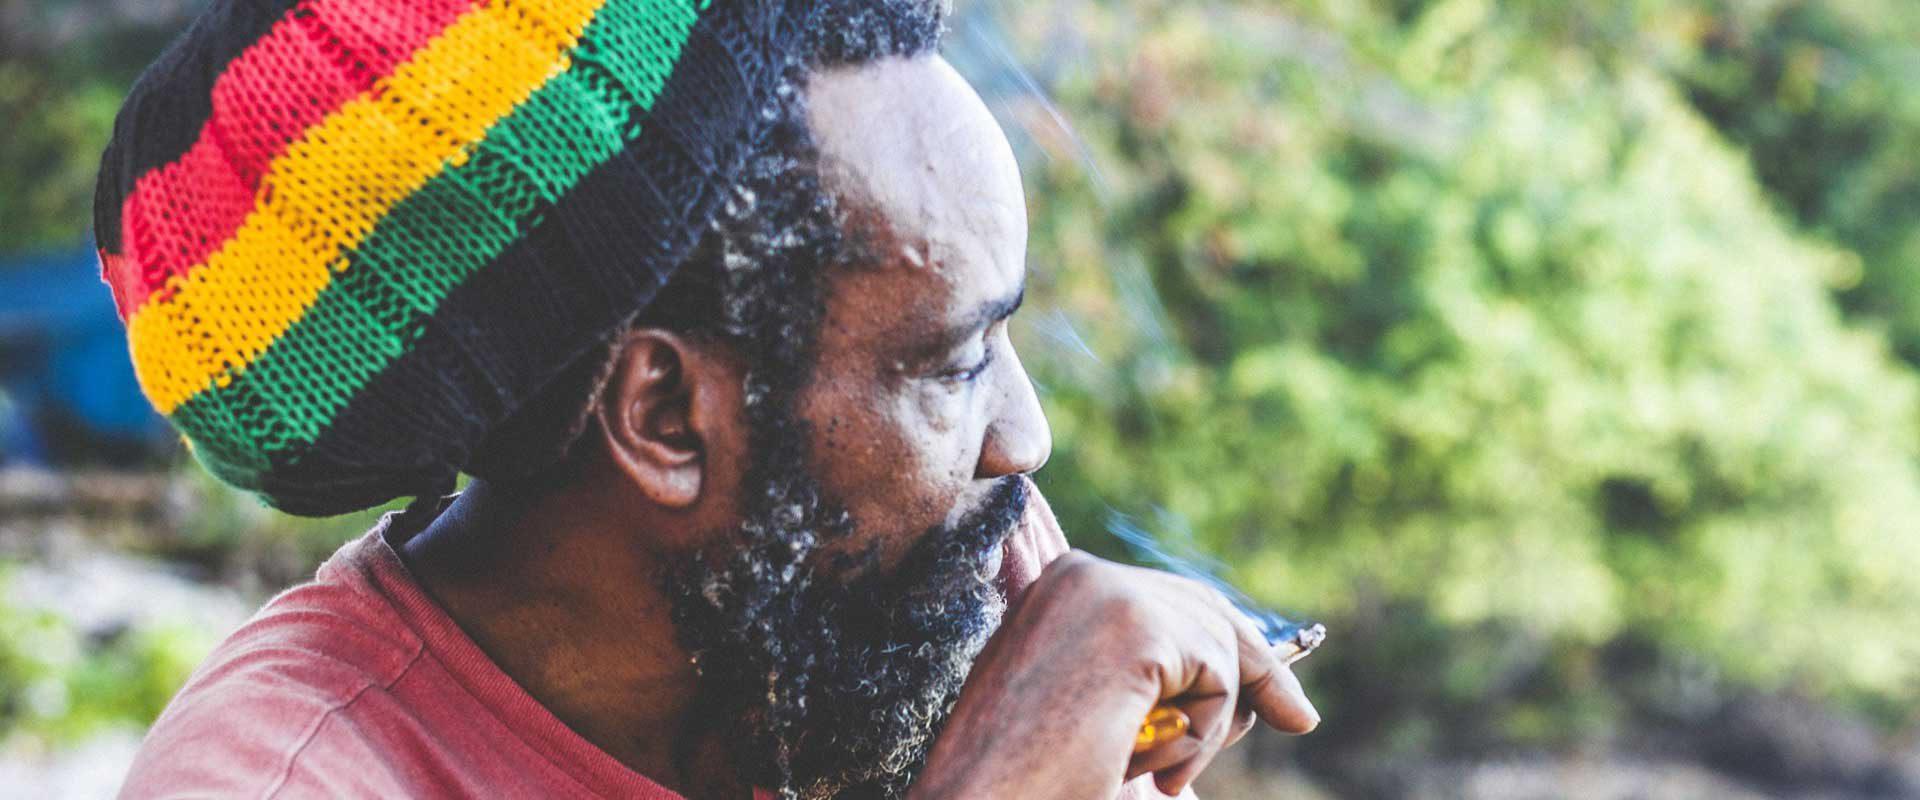 Jamaica, rastaman retrato.